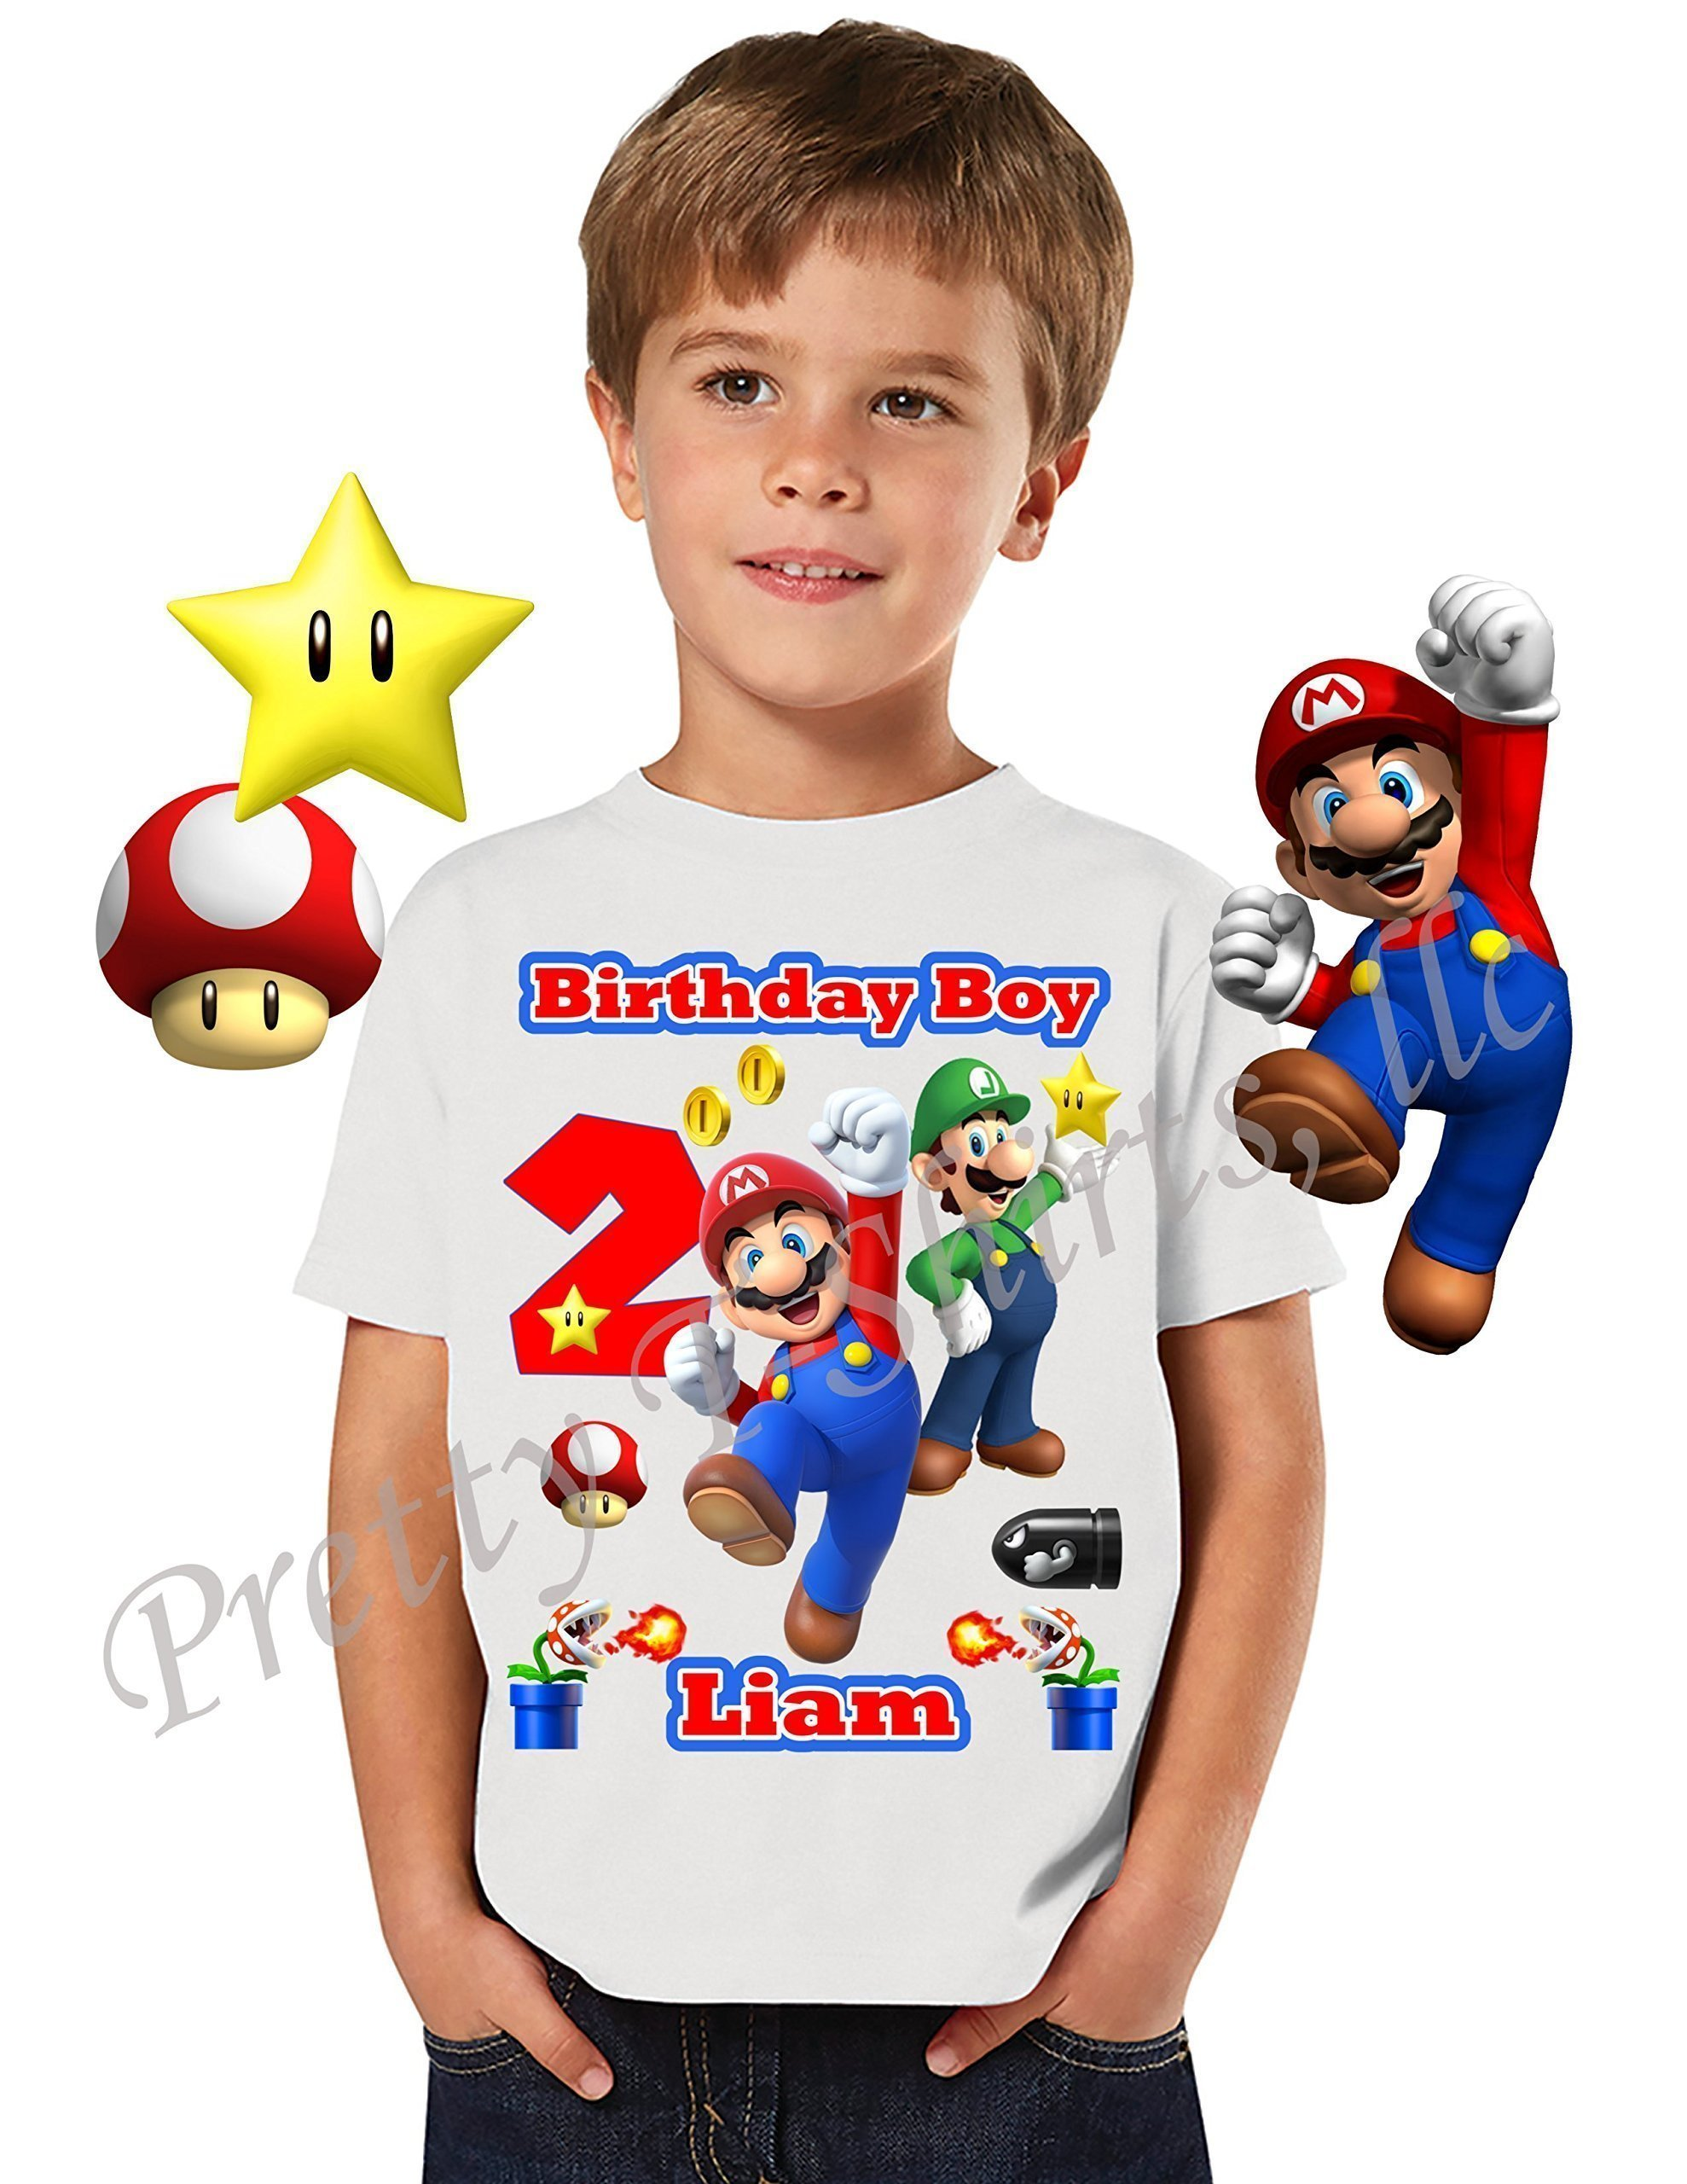 Mario Birthday Shirt, ADD any name & any age, Birthday Boy Shirt, Mario Birthday Shirt, FAMILY Matching Shirts, Super Mario Shirt, Mario & Luigi, Birthday Shirt Super Mario, VISIT OUR SHOP!!